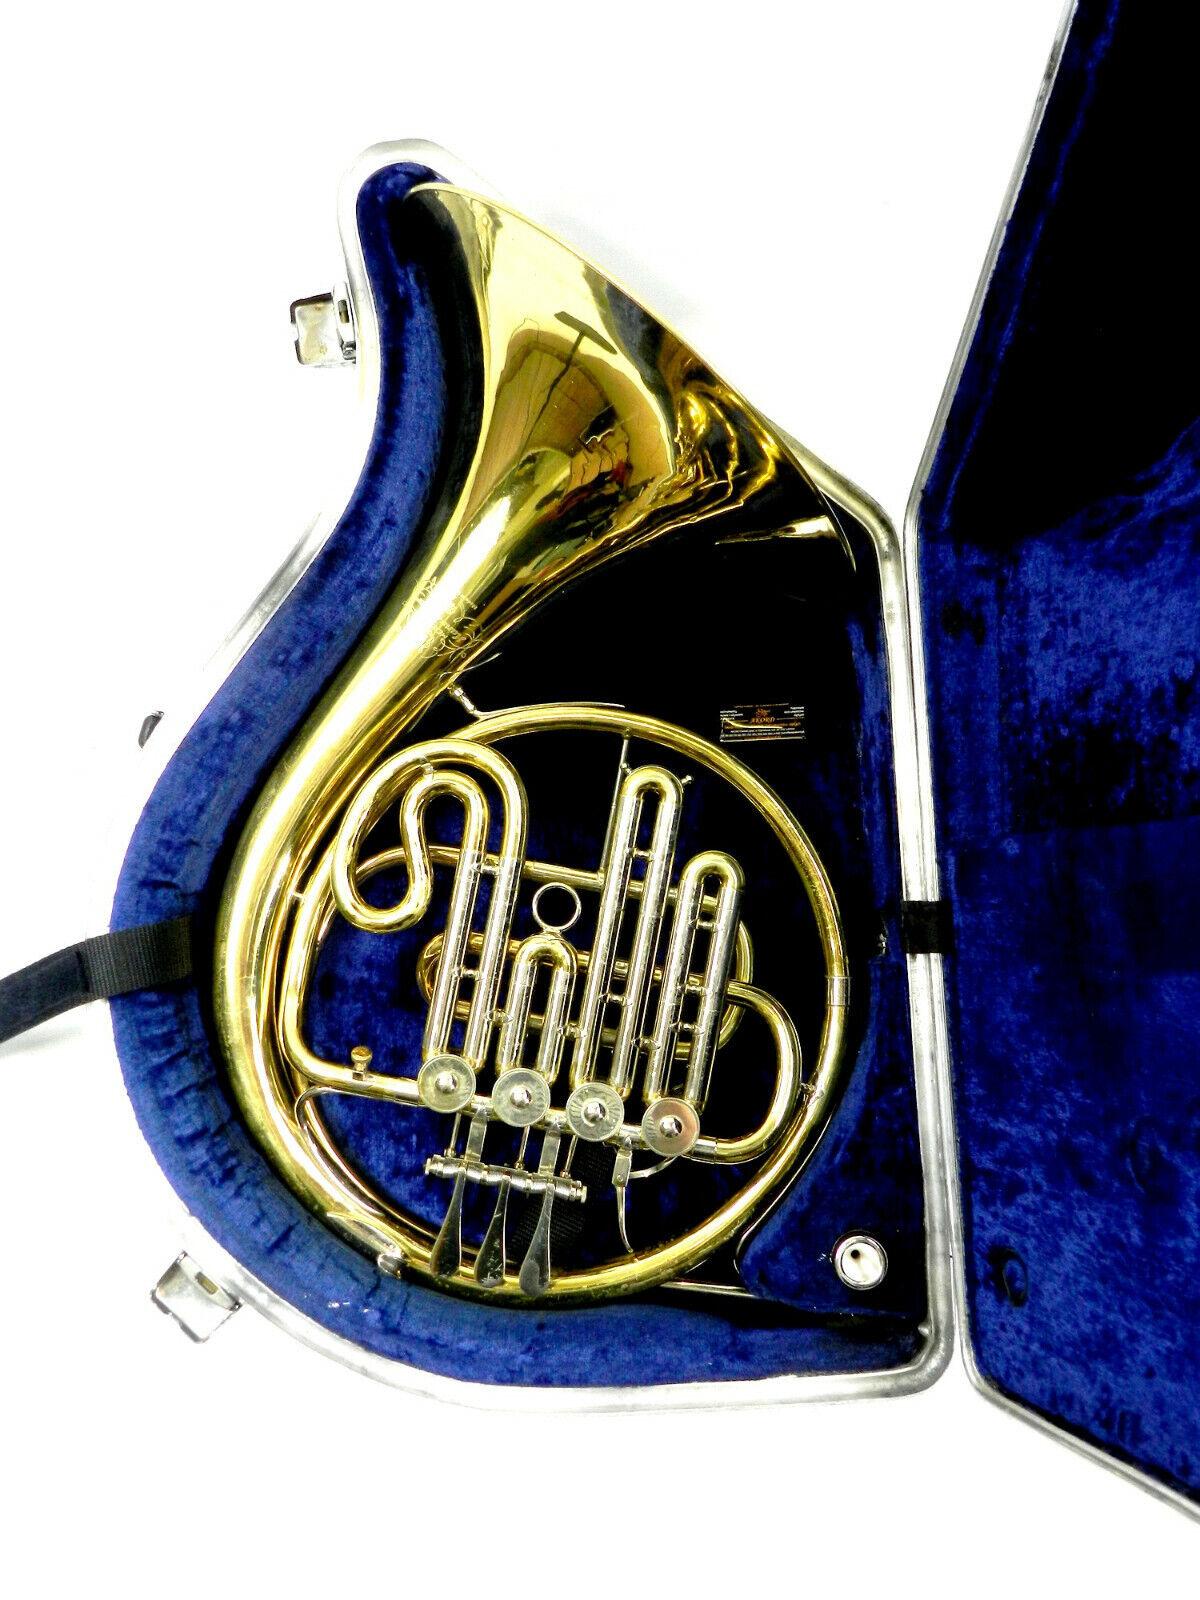 Waldhorn Waldhörner French horn B Hans Hoyer 704 Technical Review (DR19-201)